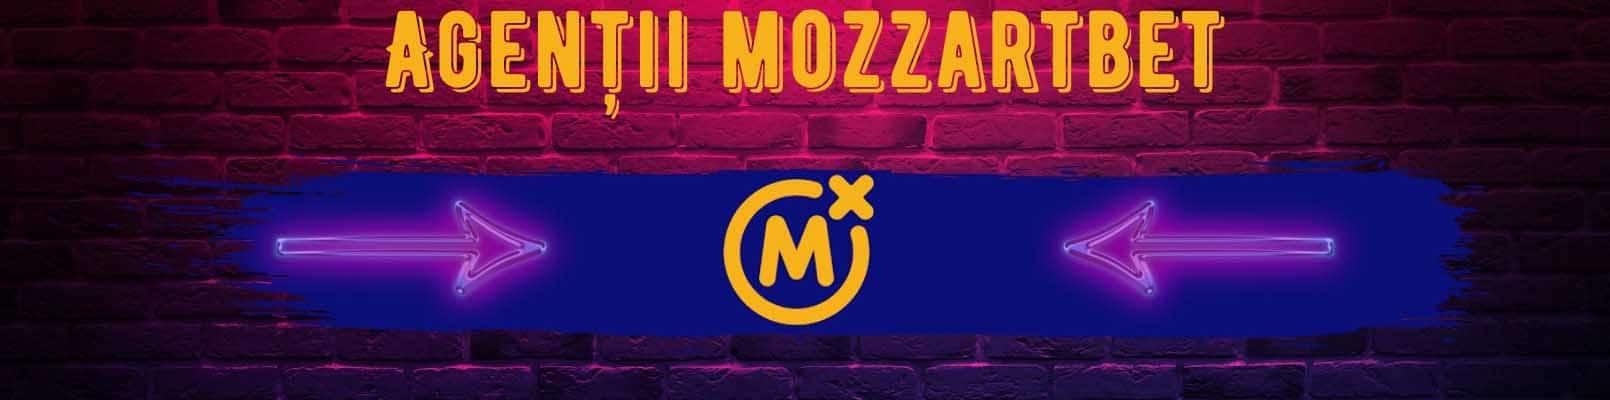 informații utile agenții mozzartbet